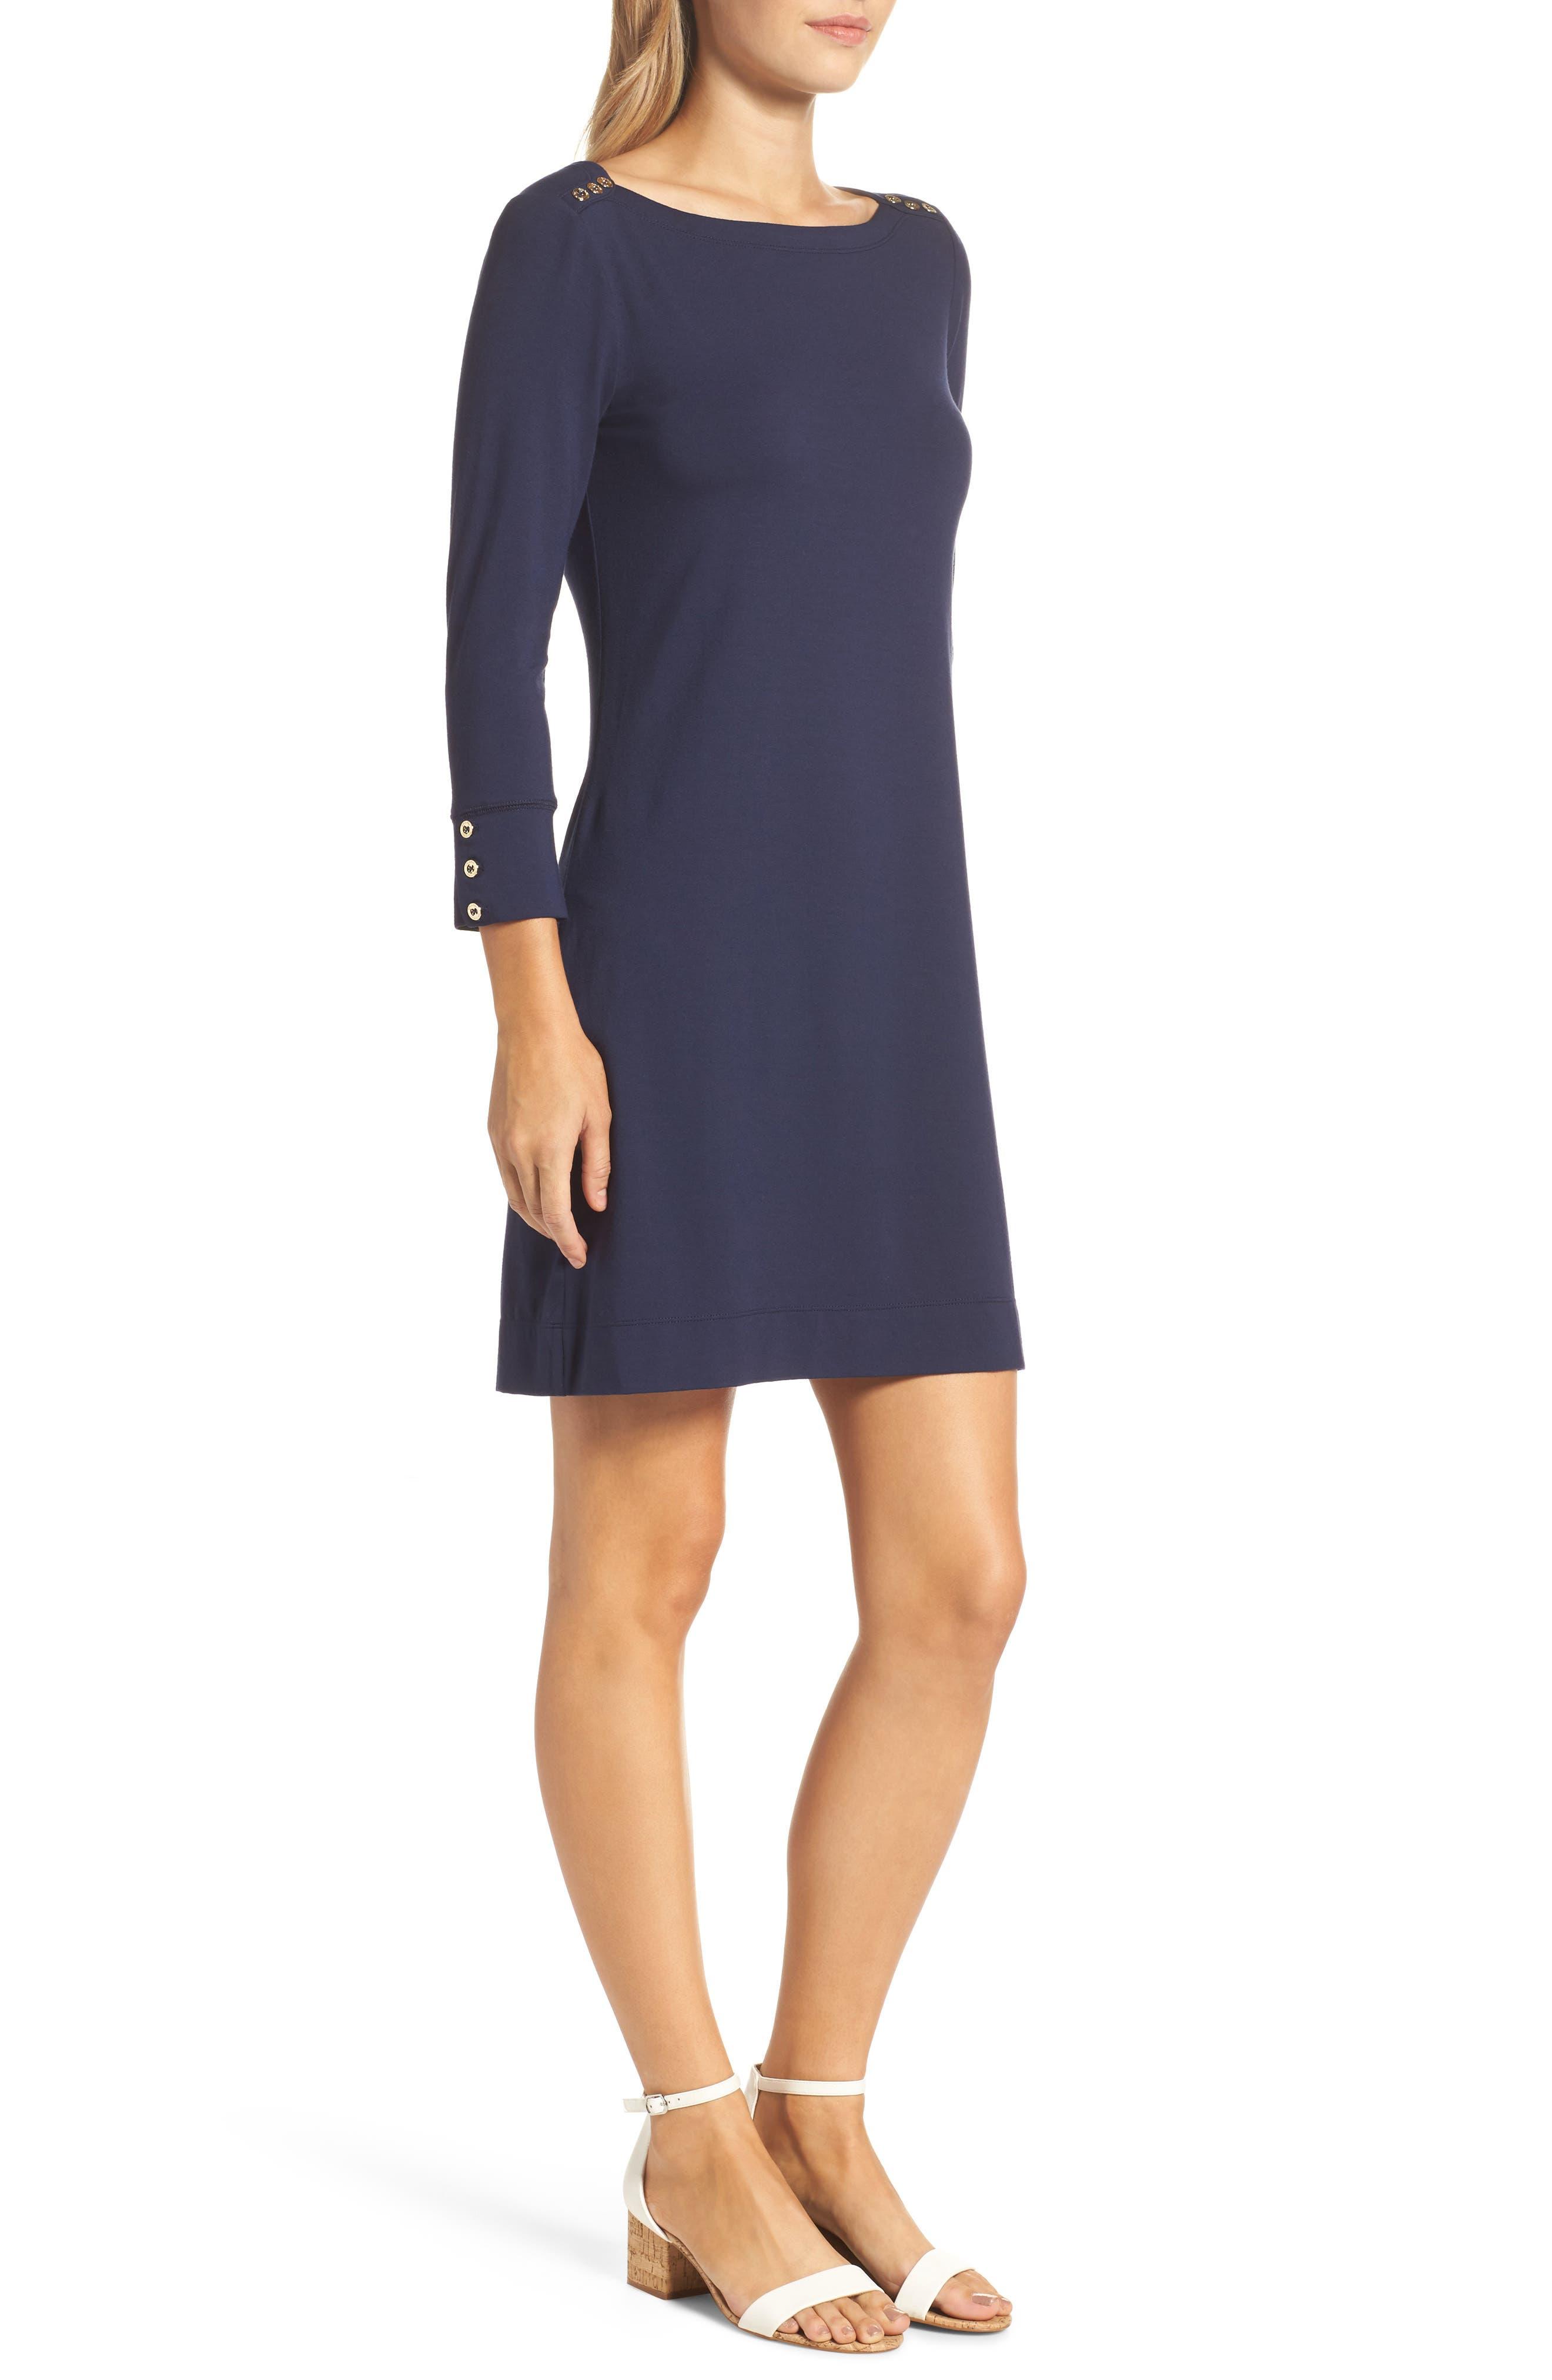 Sophie UPF 50+ Dress,                             Alternate thumbnail 3, color,                             True Navy